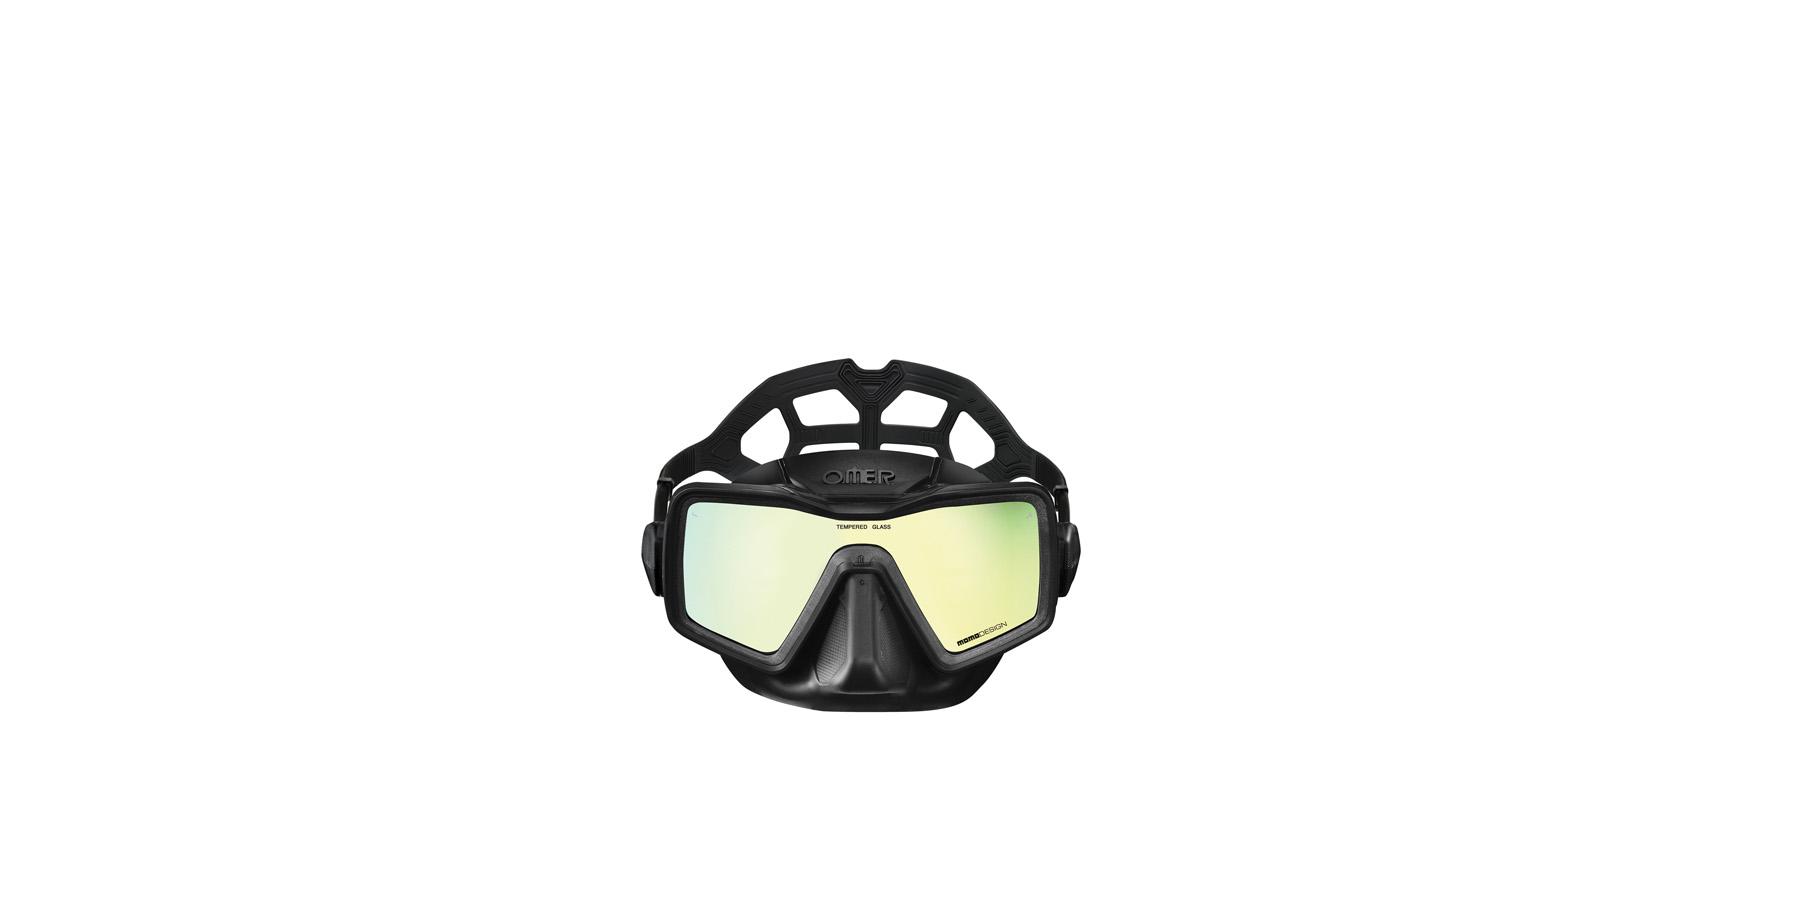 MAsch - Un masque d'apnée mono vitre